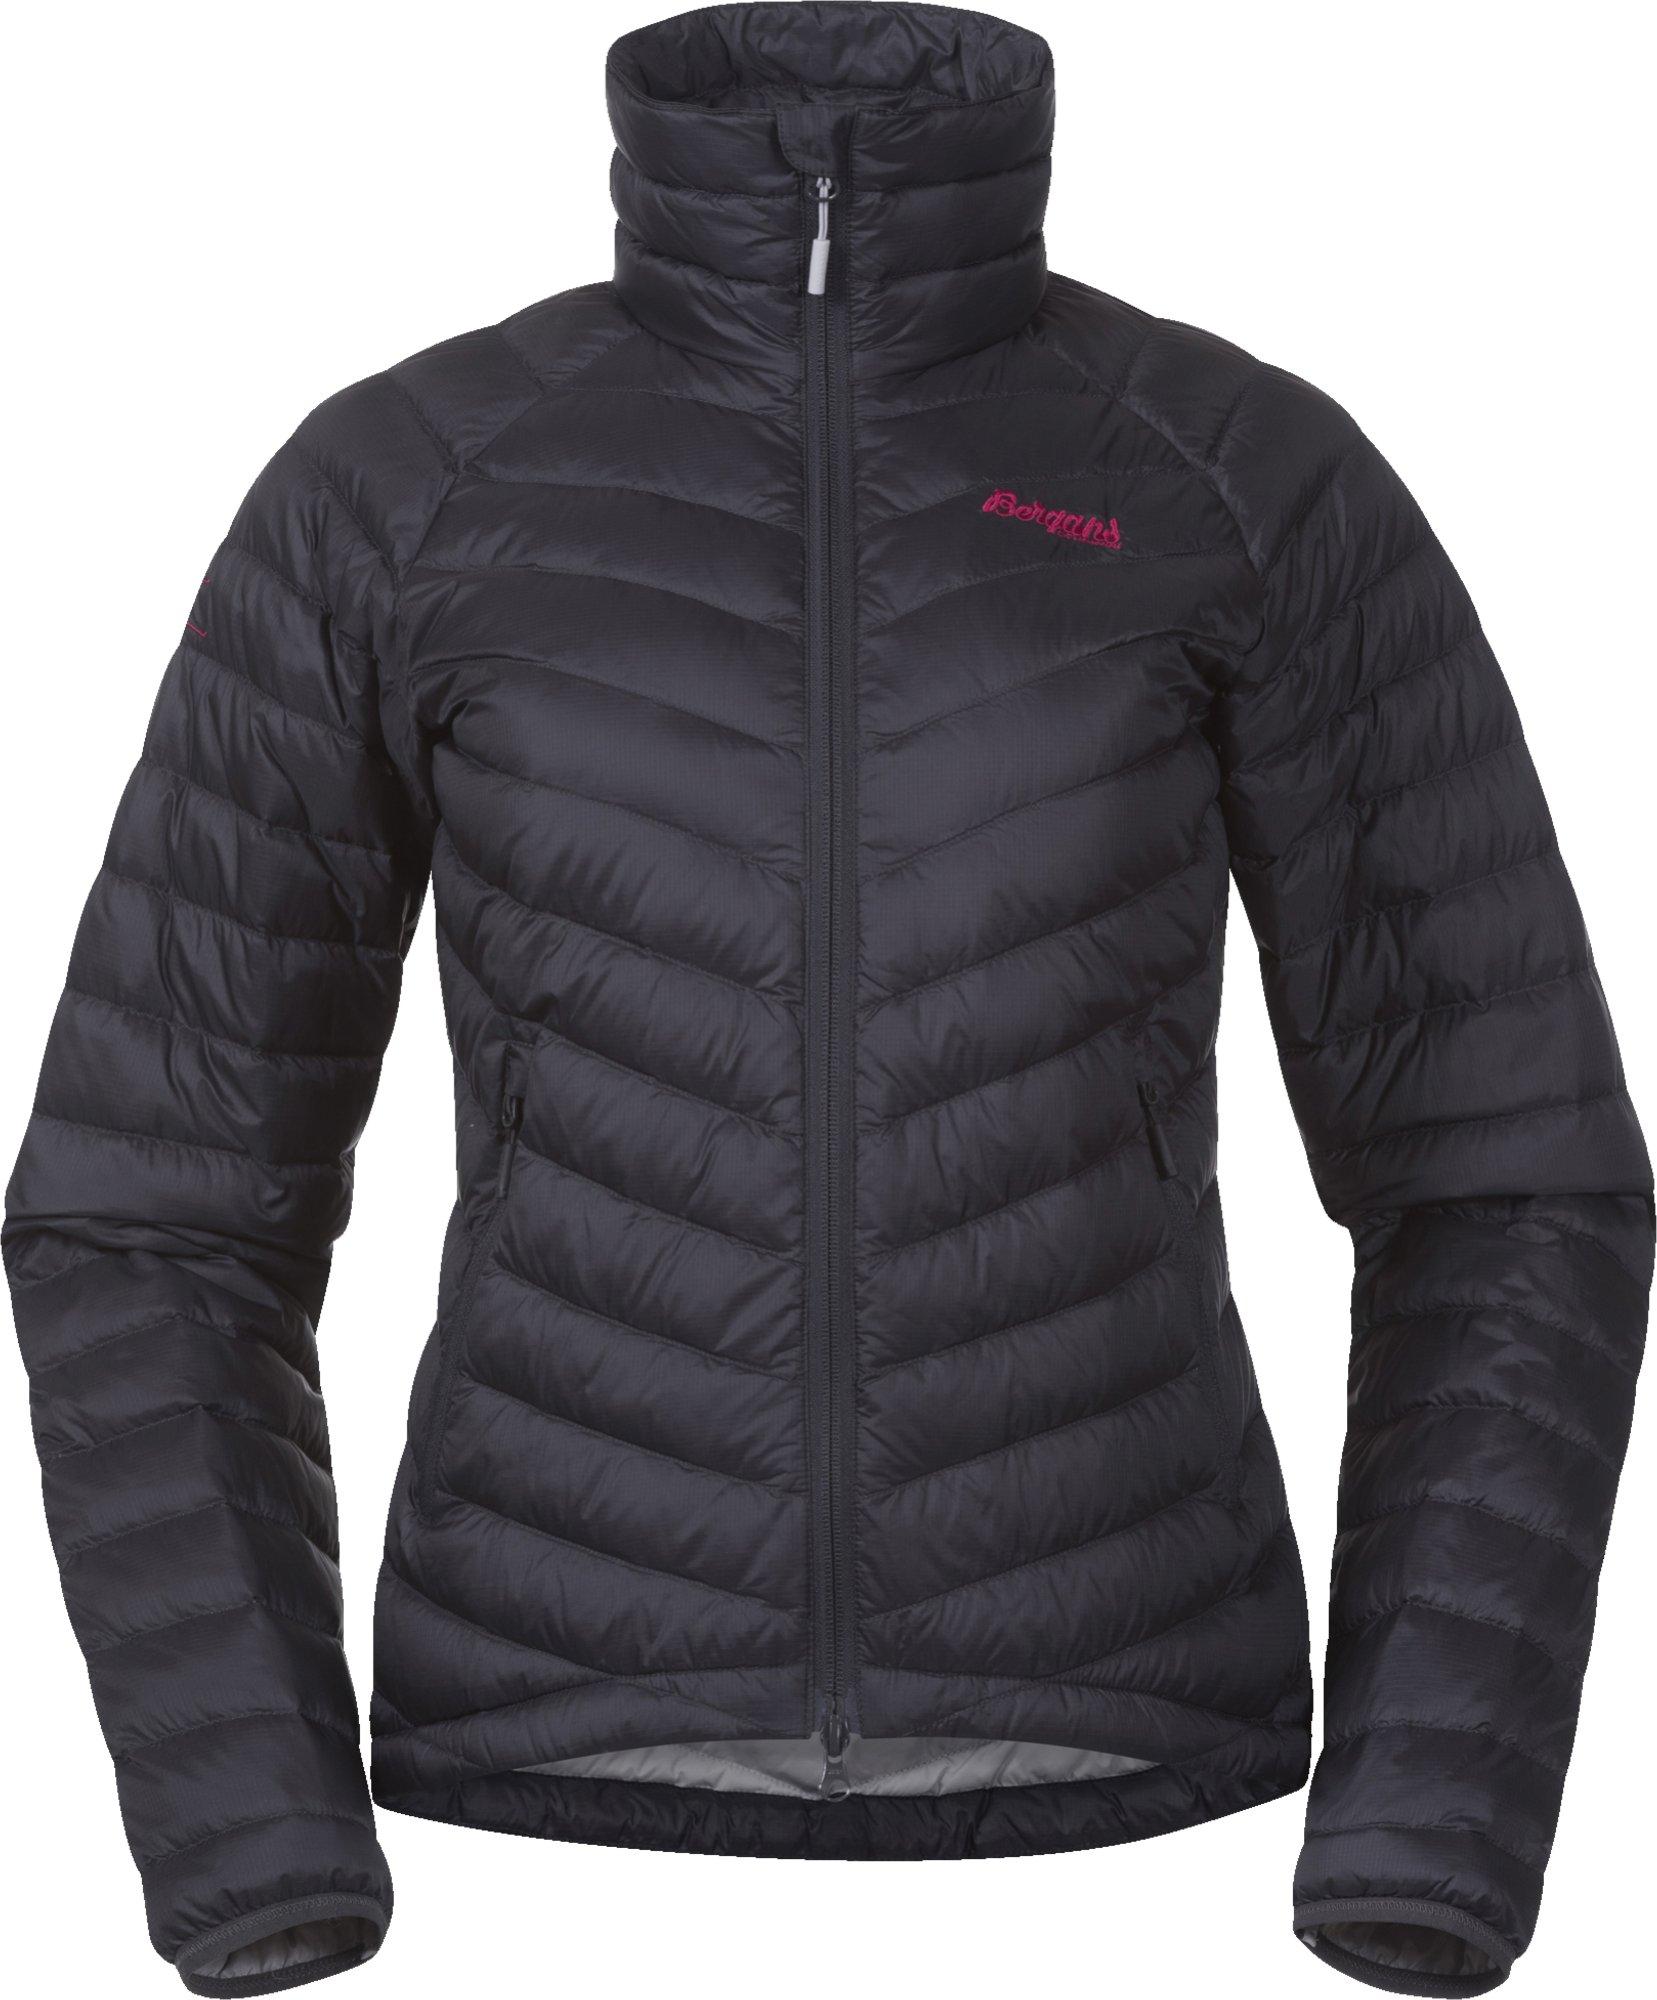 Bergans Romsdal Down Jacket (Dame) laveste priser